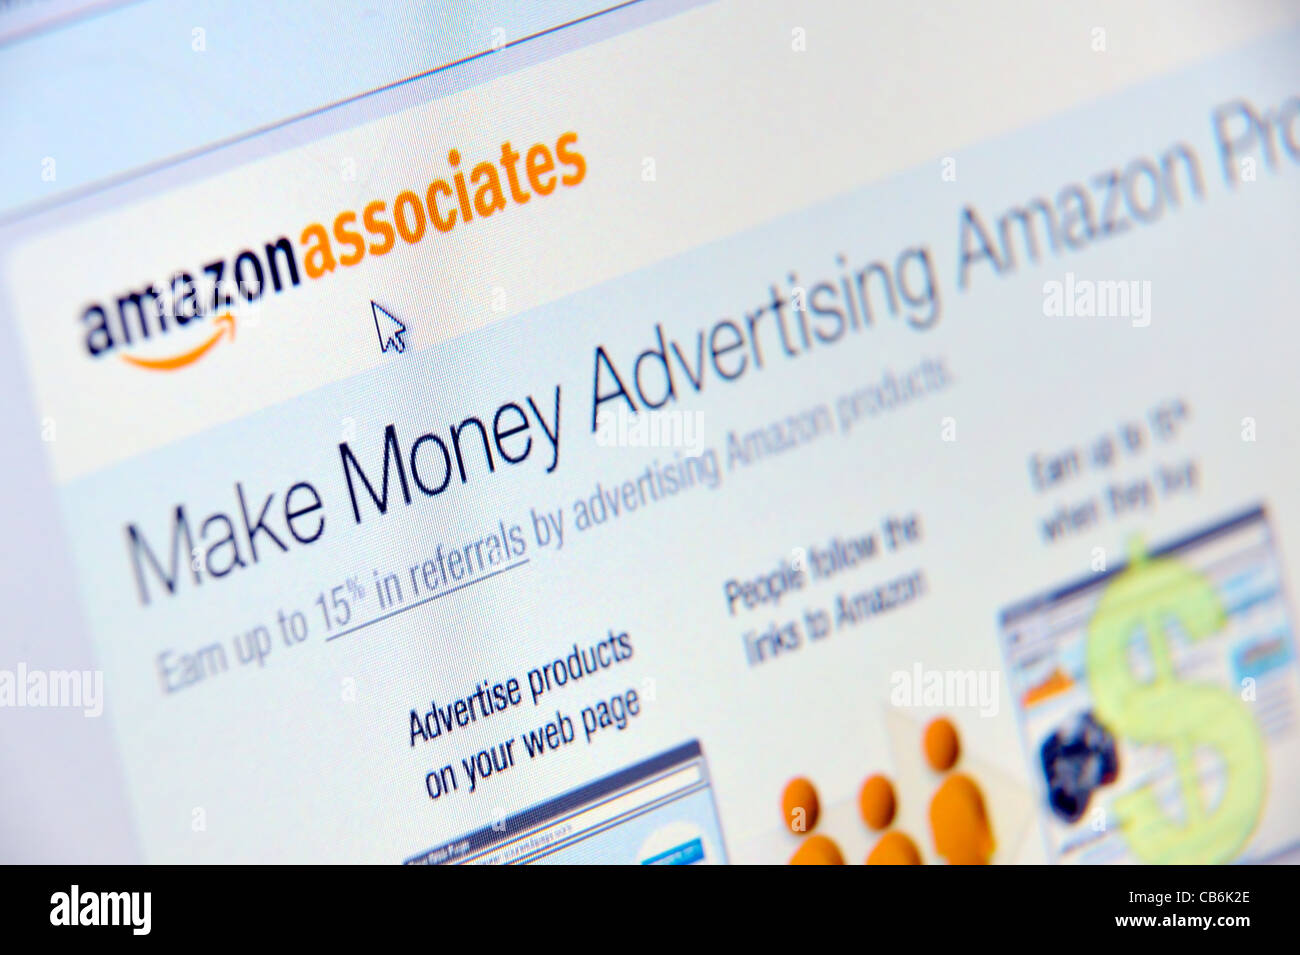 amazon advertise - Stock Image